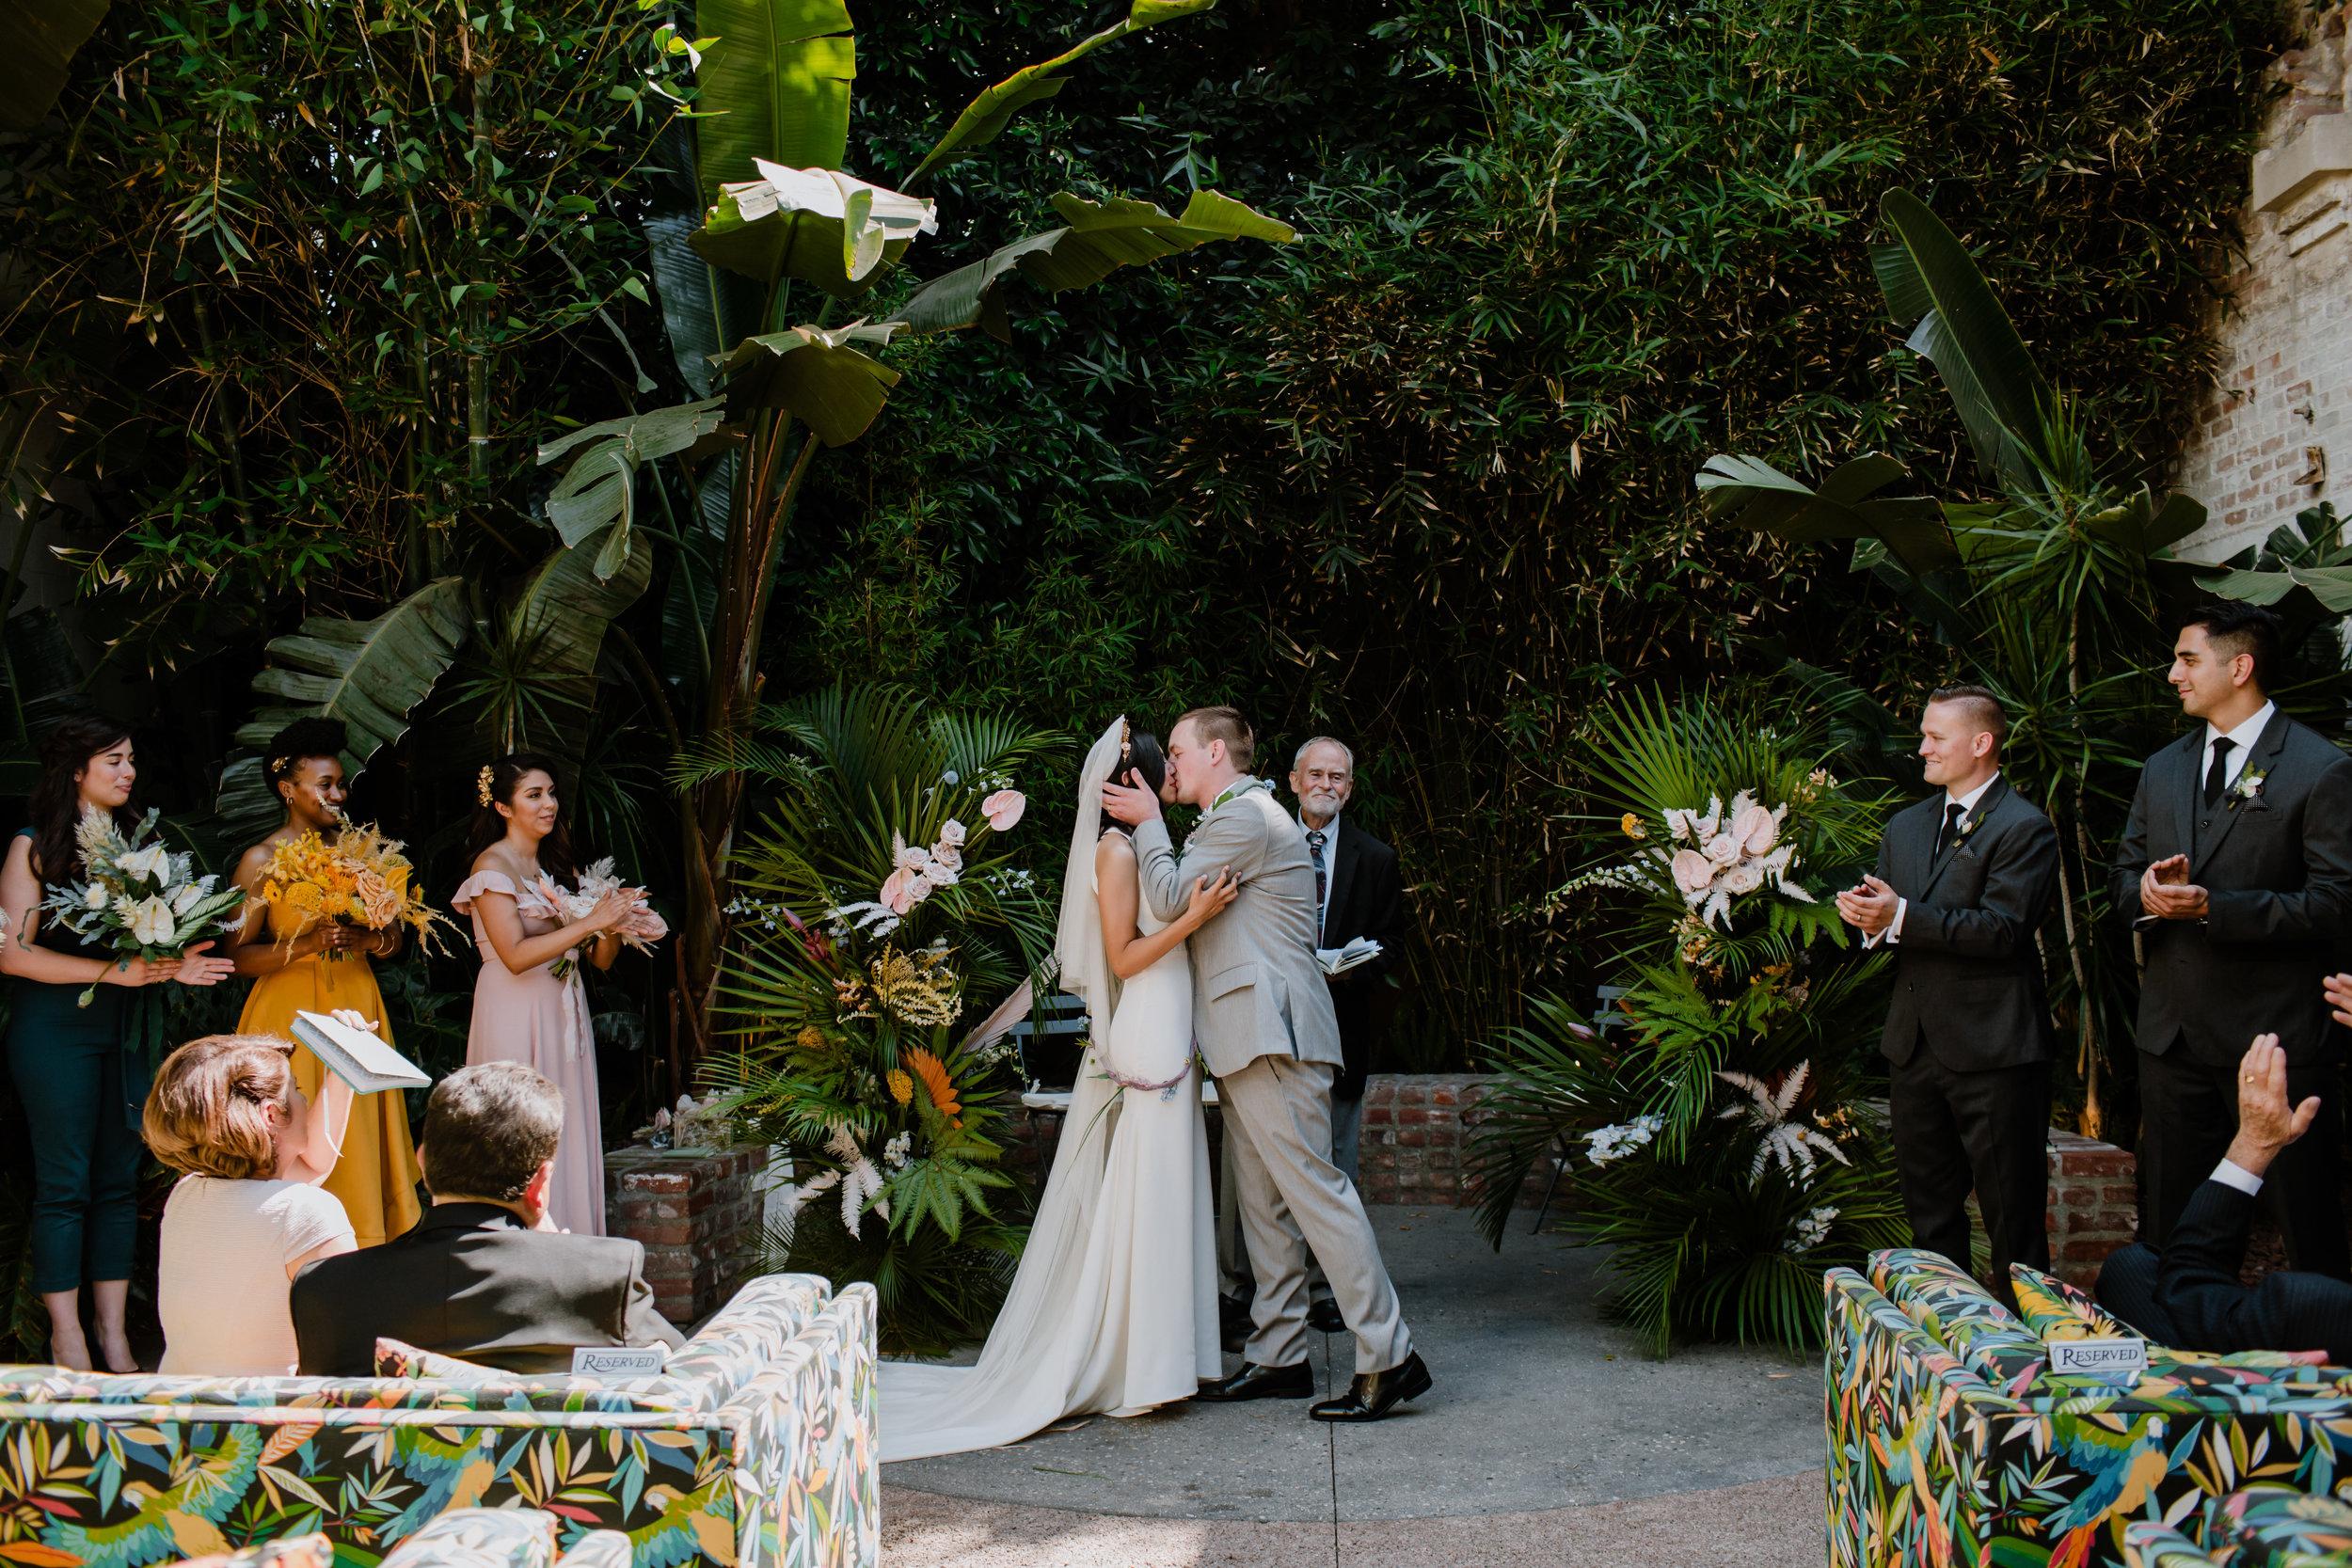 Sharon and Adam Millwick Wedding Downtown Los Angeles - Eve Rox Photography-87.jpg